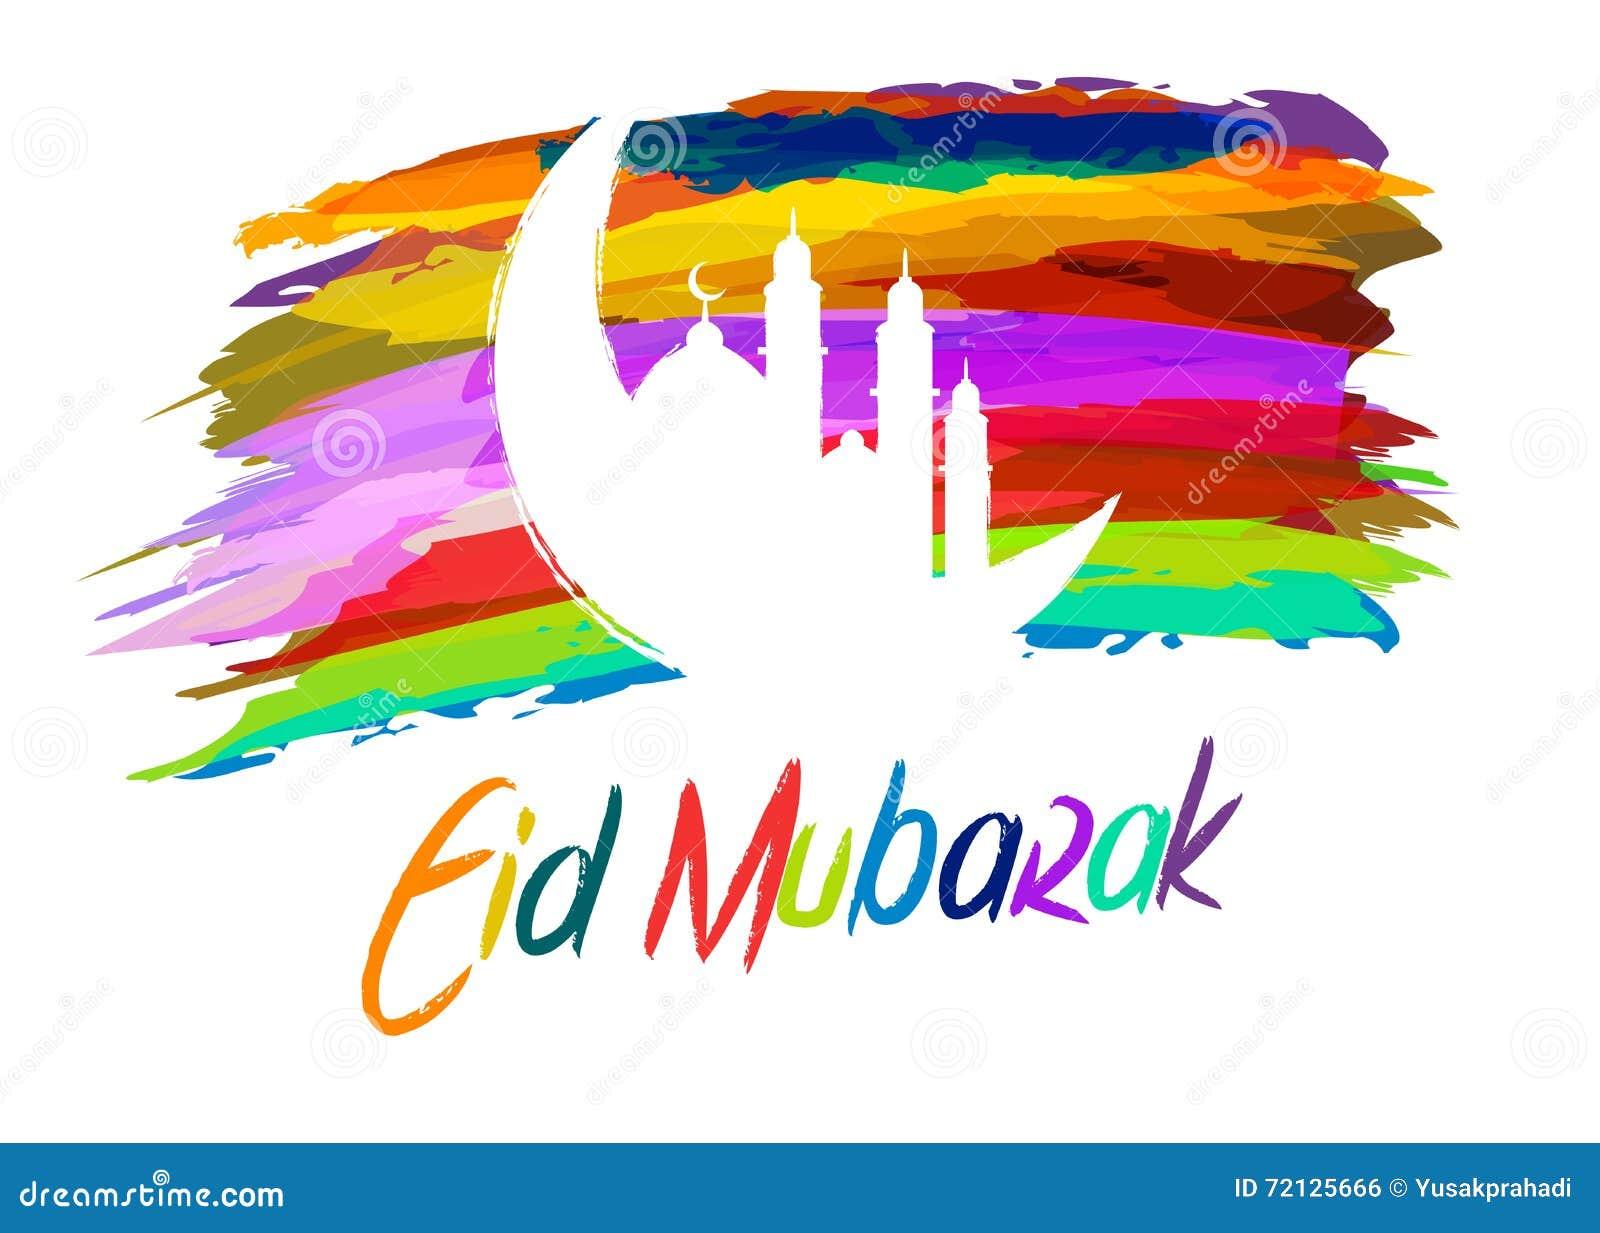 Islamic eid mubarak greetings with abstract paint brush stock islamic eid mubarak greetings with abstract paint brush kristyandbryce Choice Image